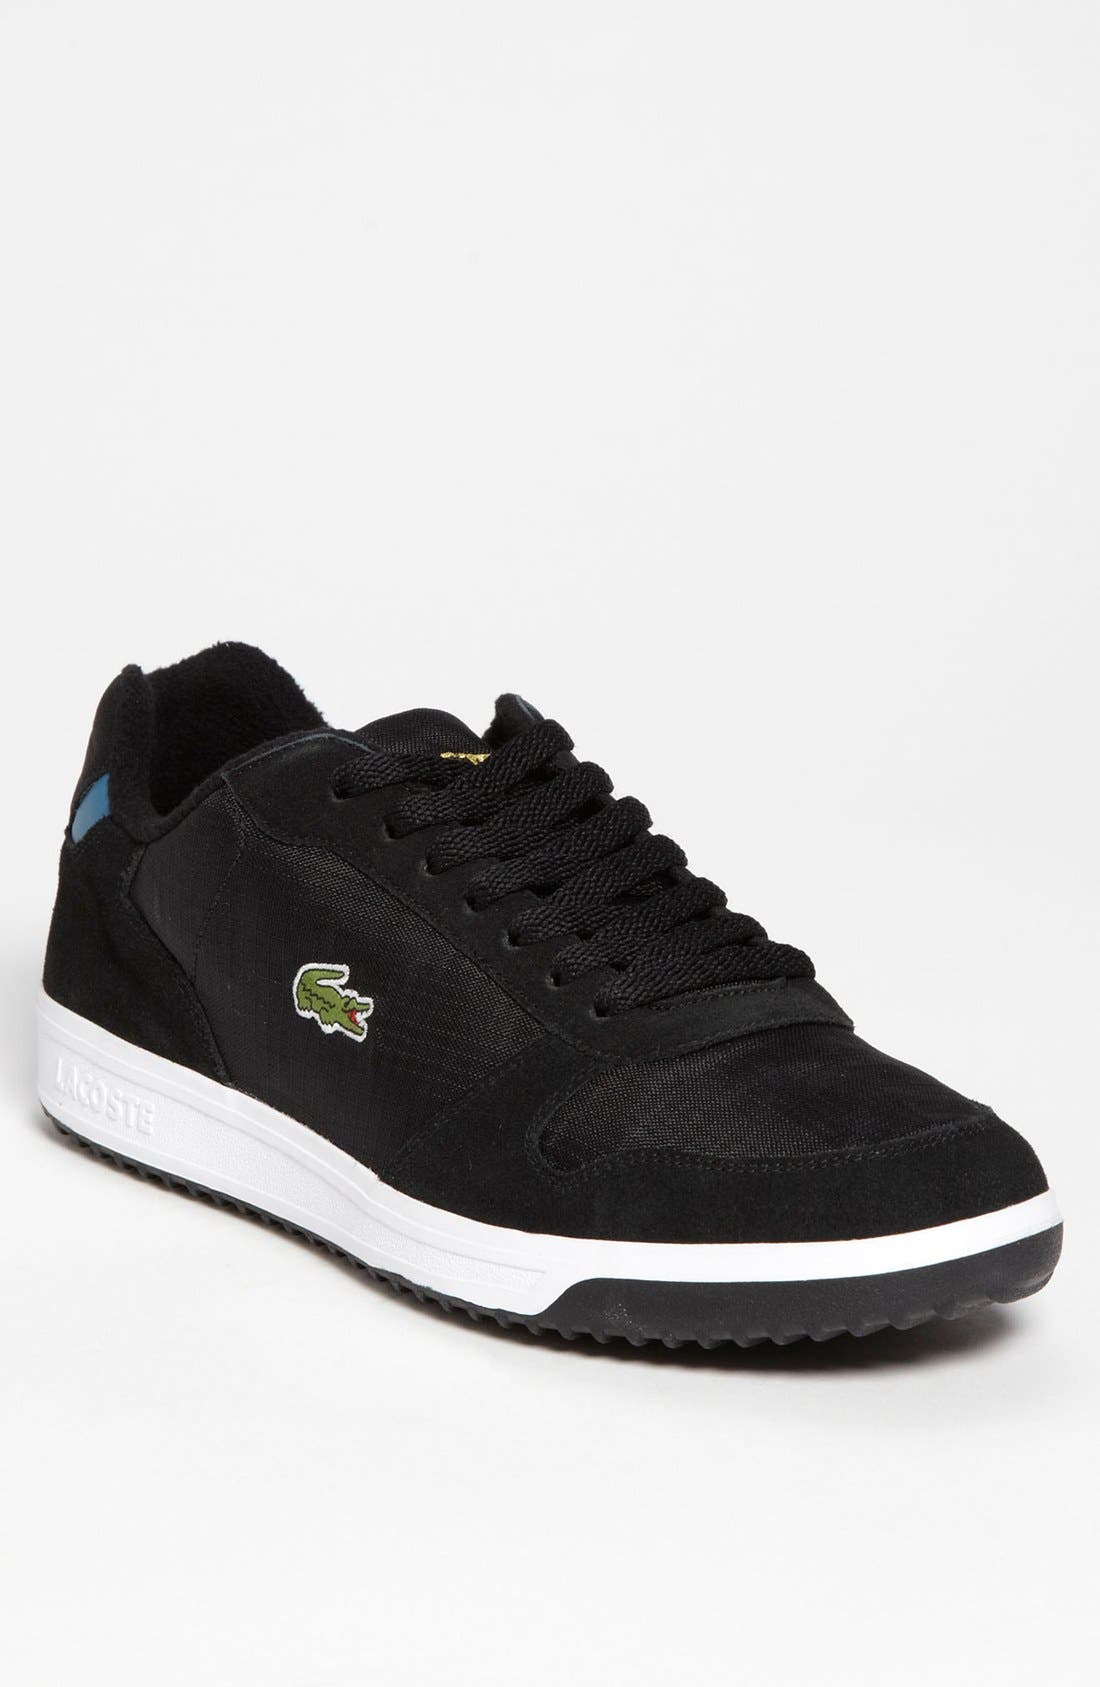 Alternate Image 1 Selected - Lacoste 'Jenson' Sneaker